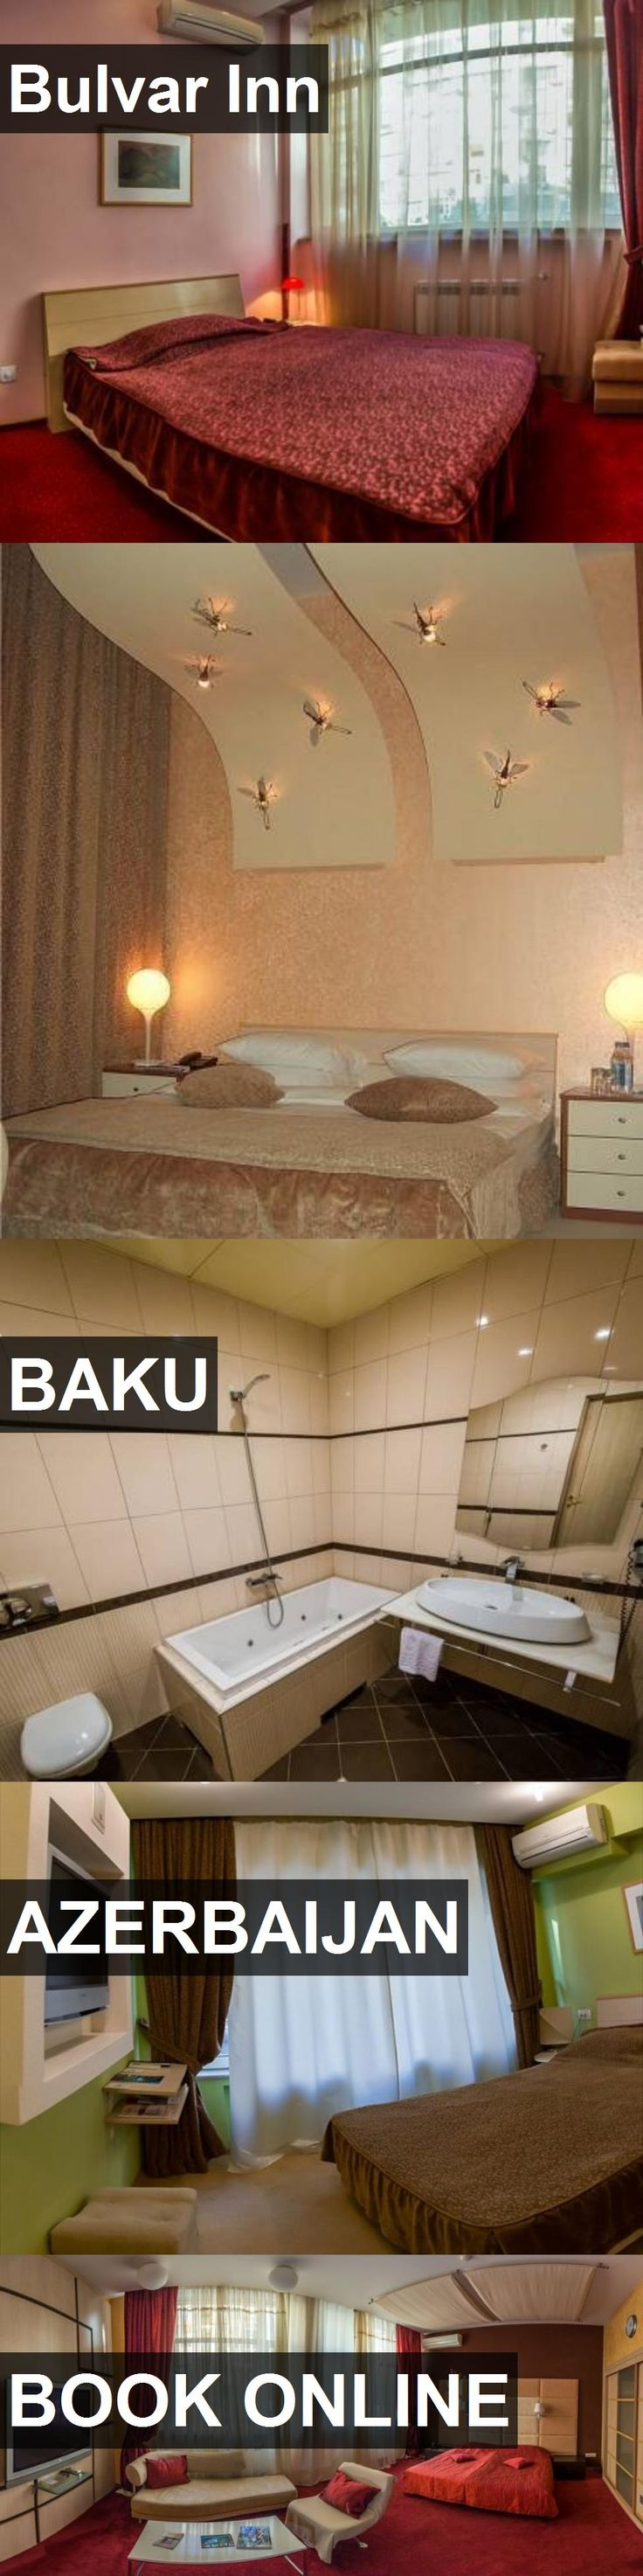 Hotel Bulvar Inn in Baku, Azerbaijan. For more information, photos, reviews and best prices please follow the link. #Azerbaijan #Baku #travel #vacation #hotel